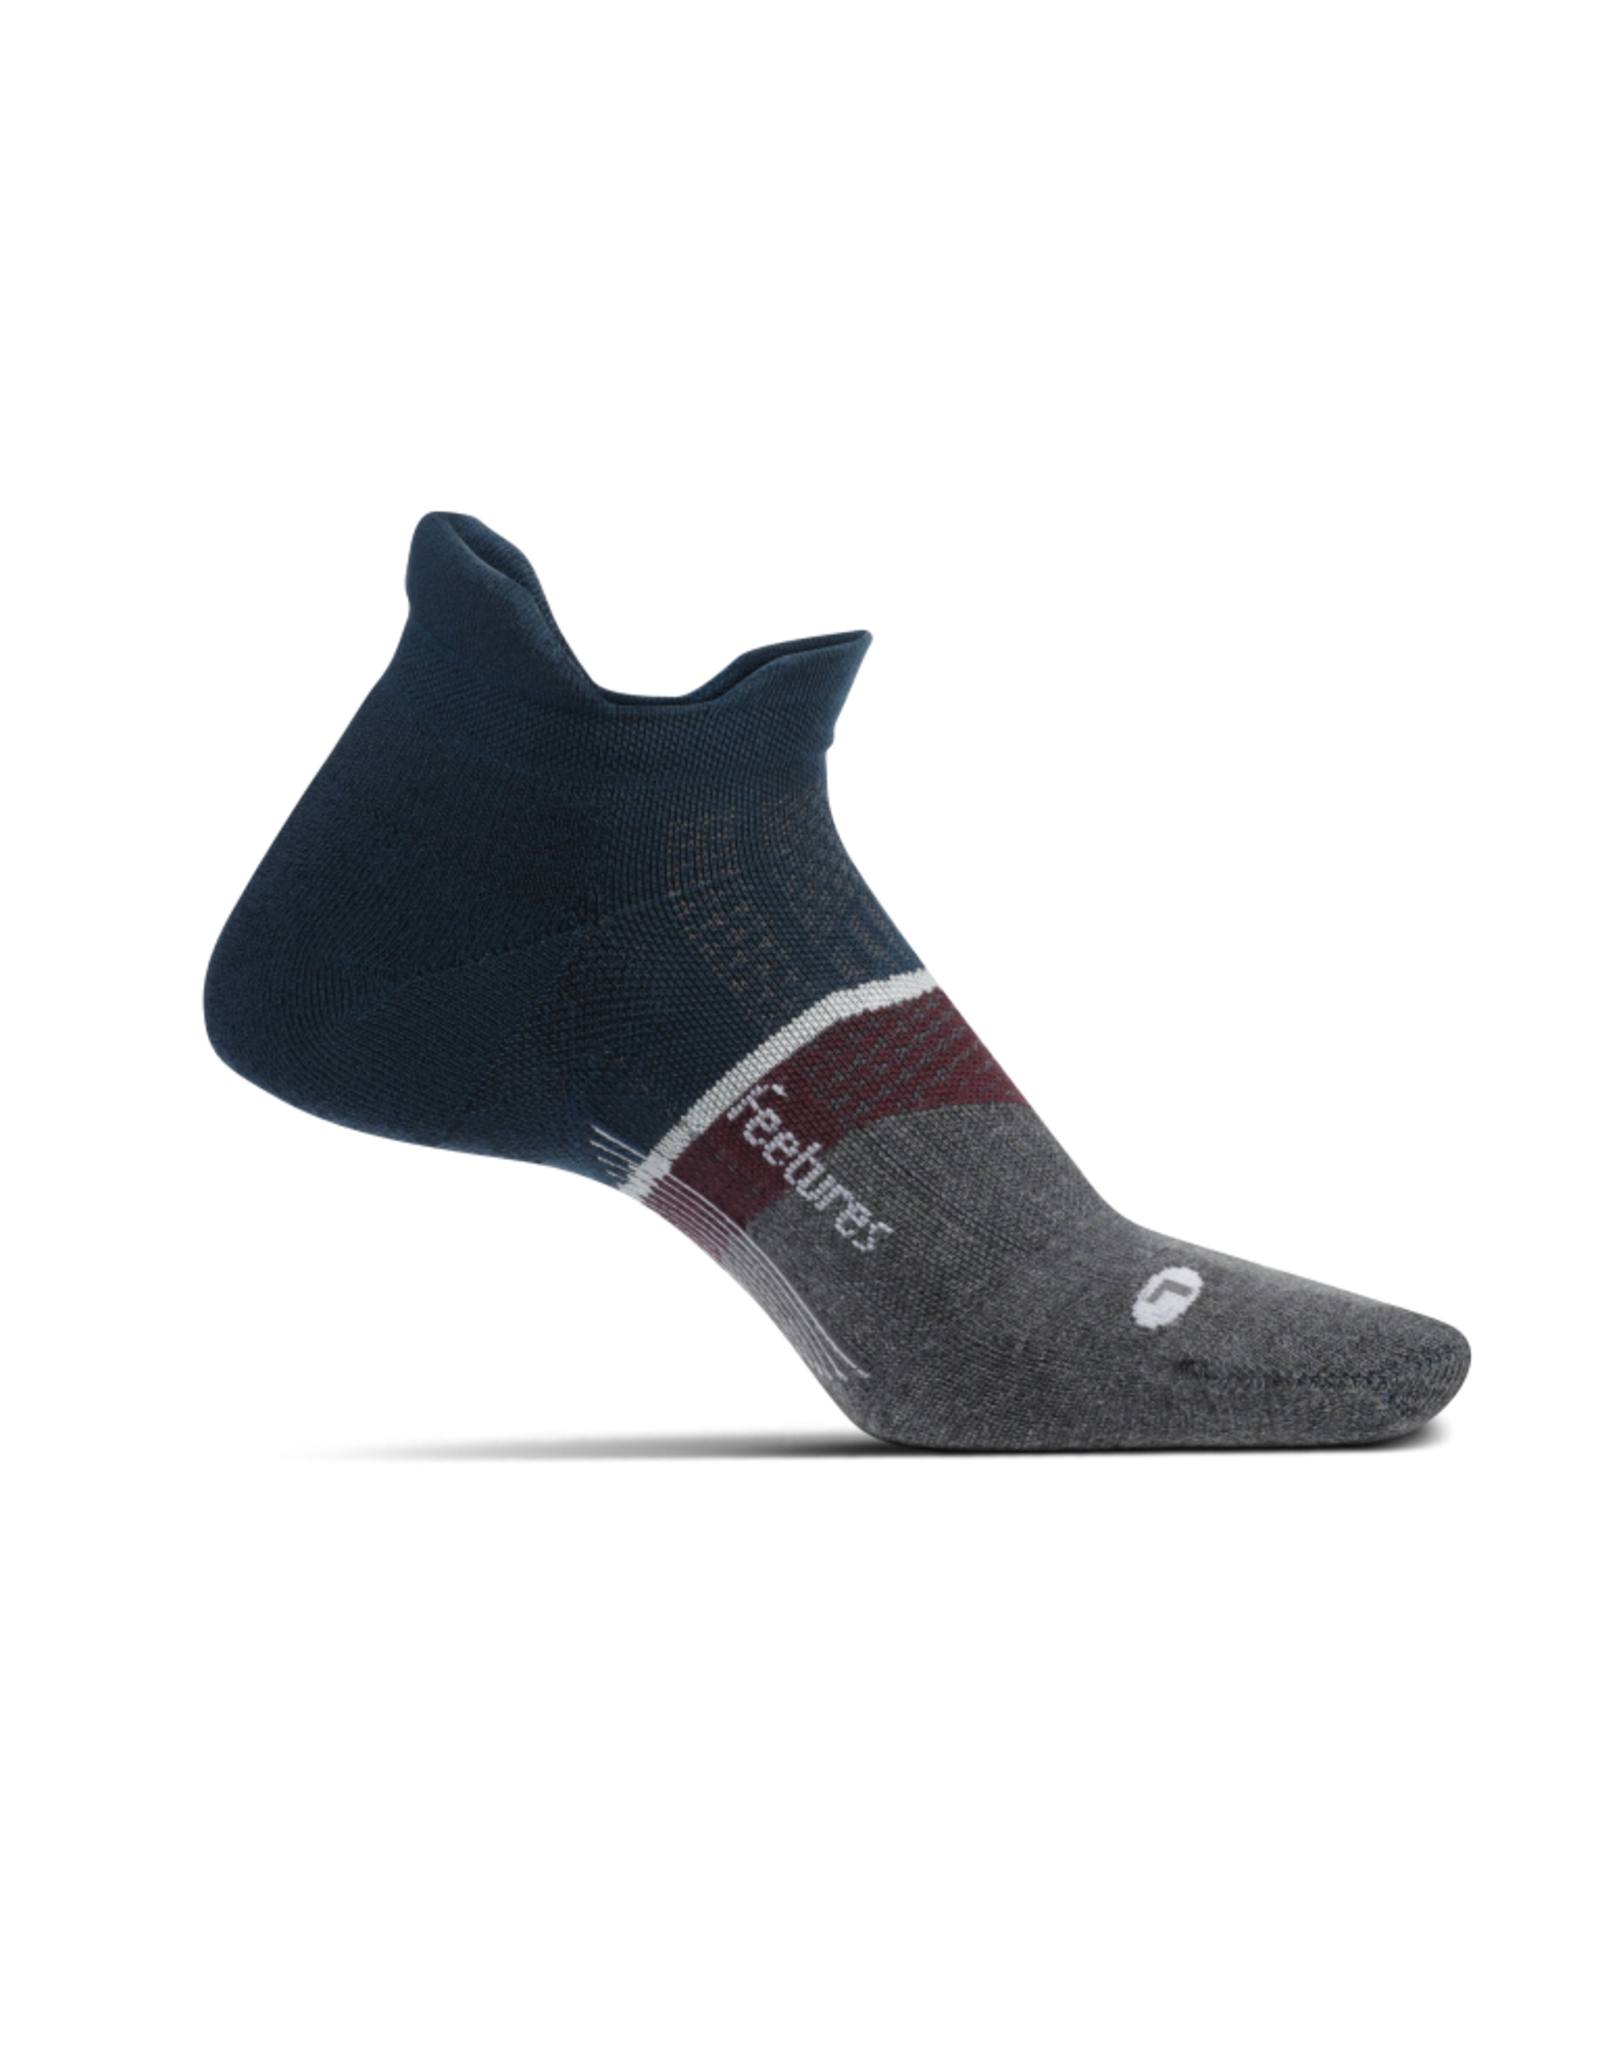 Feetures Feetures Elite Max Cusion No Show Tab Sock